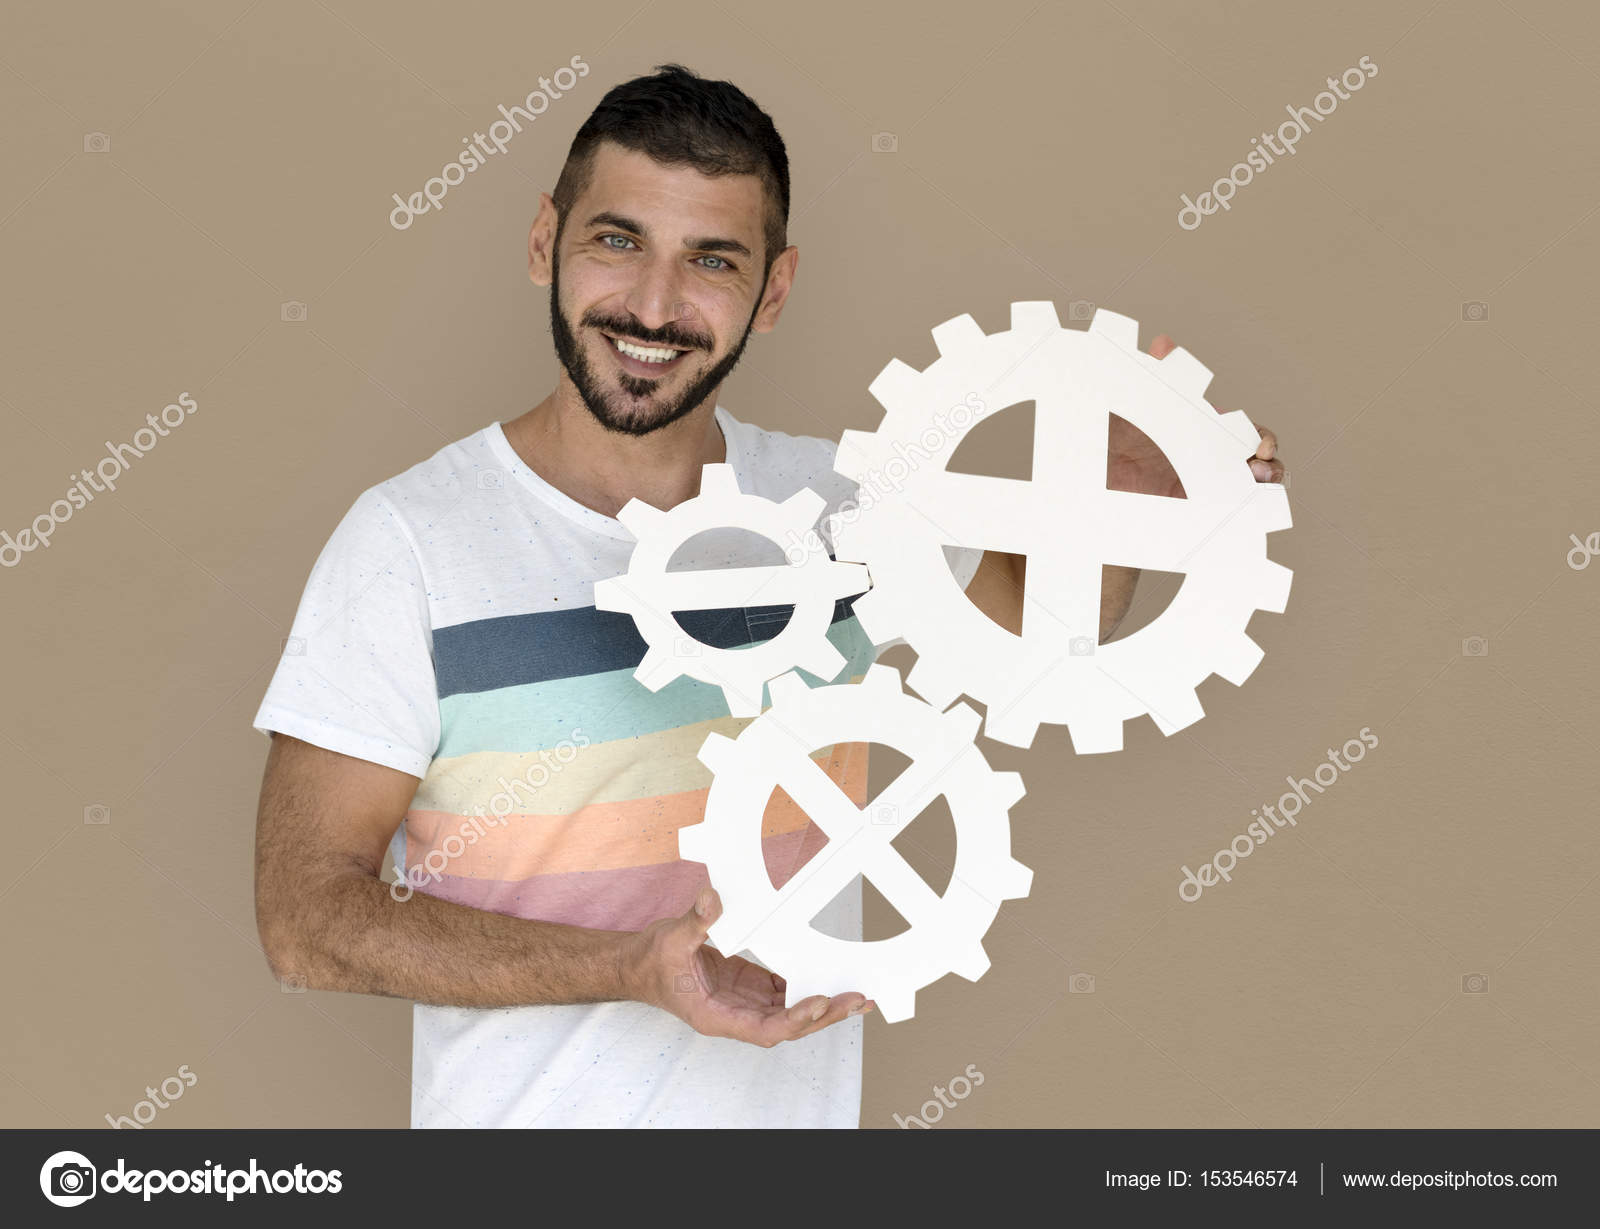 Middle eastern man holding gears stock photo rawpixel 153546574 middle eastern man holding gears stock photo biocorpaavc